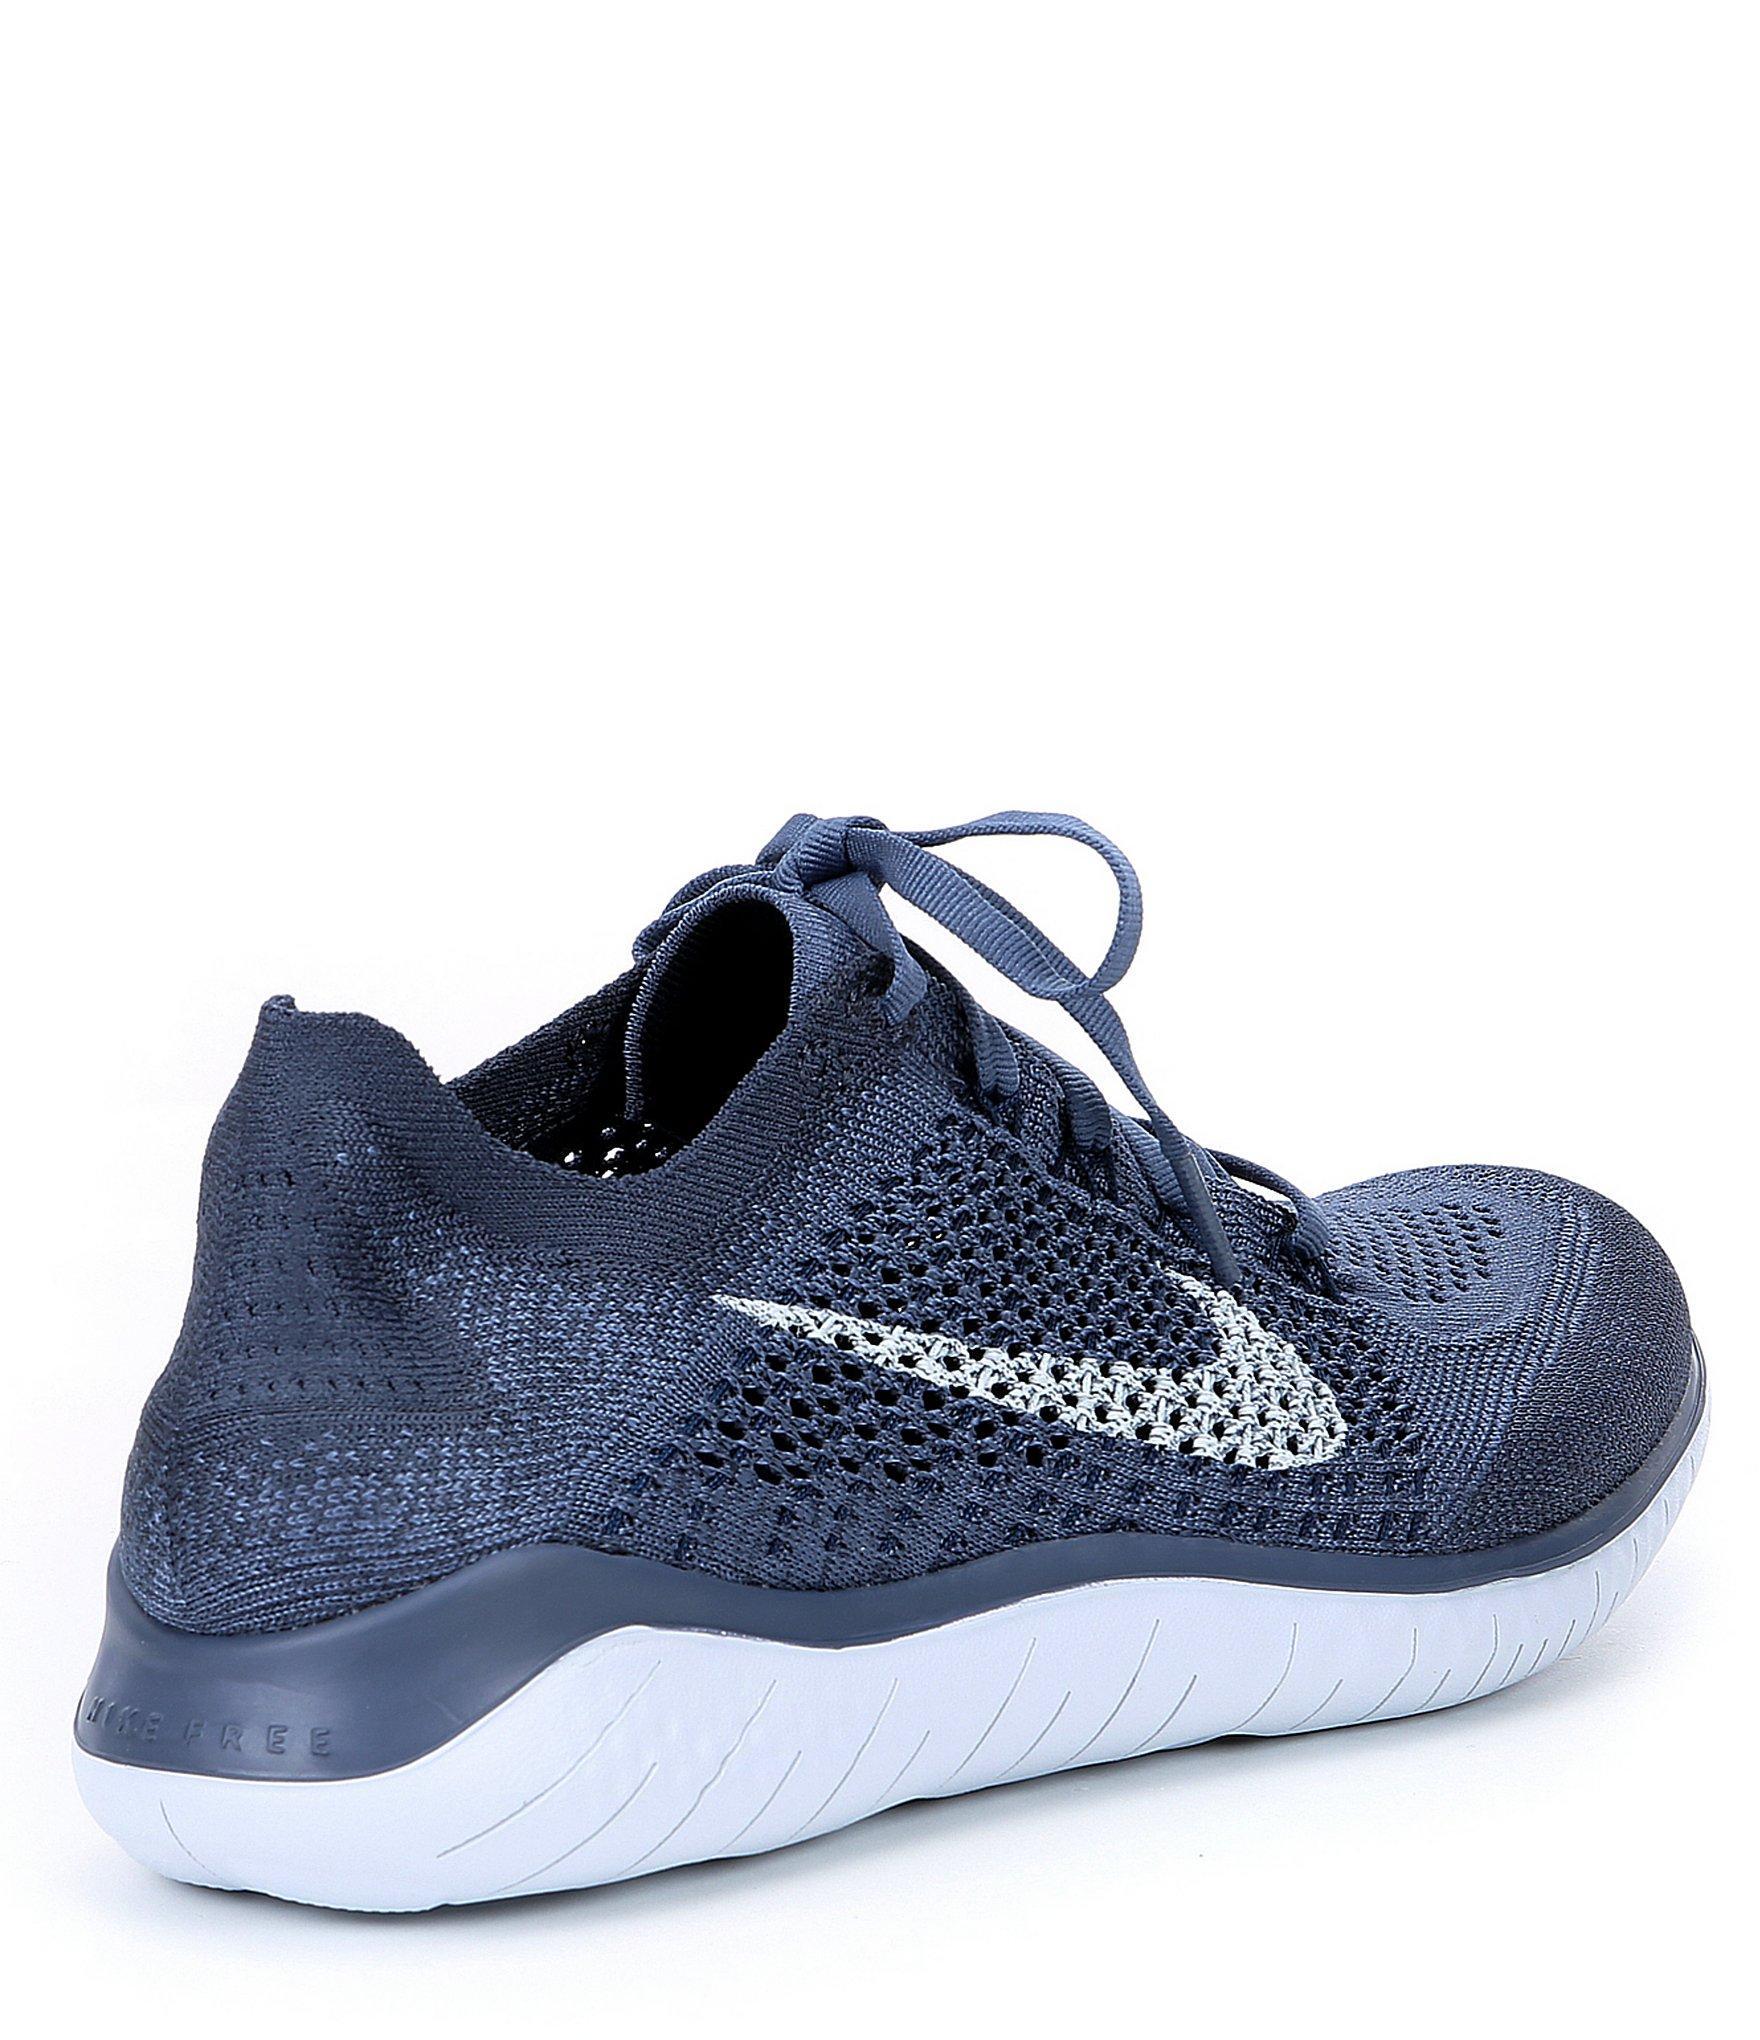 538c203b2872 Nike - Blue Men s Free Rn Flyknit Running Shoes for Men - Lyst. View  fullscreen